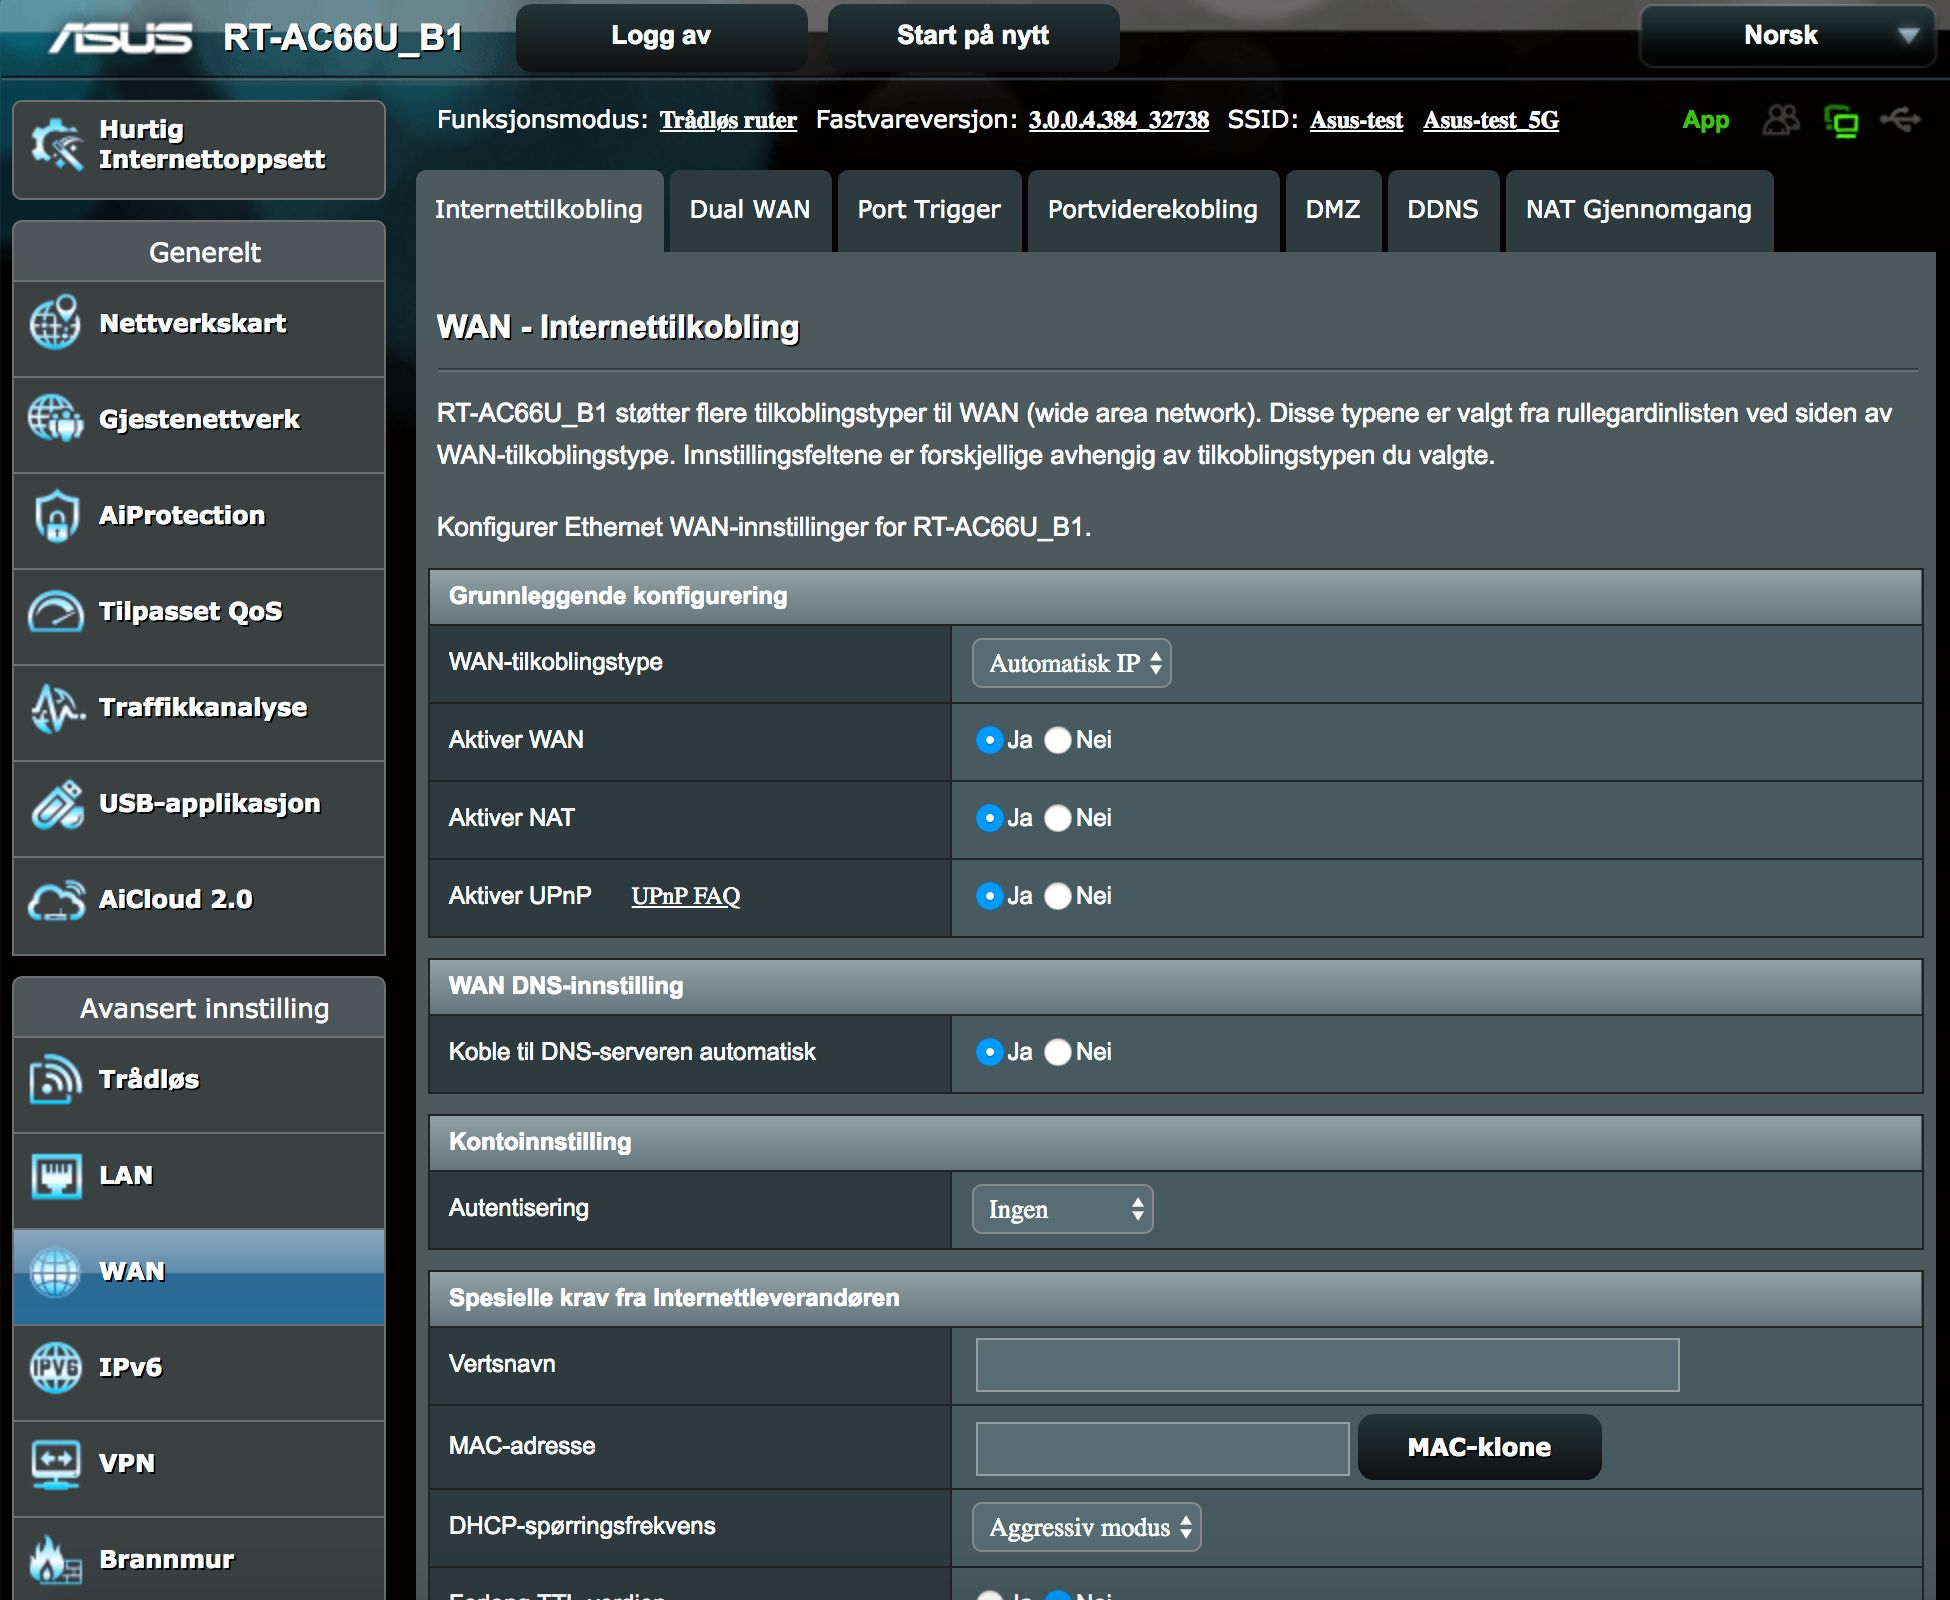 Asus webportal.